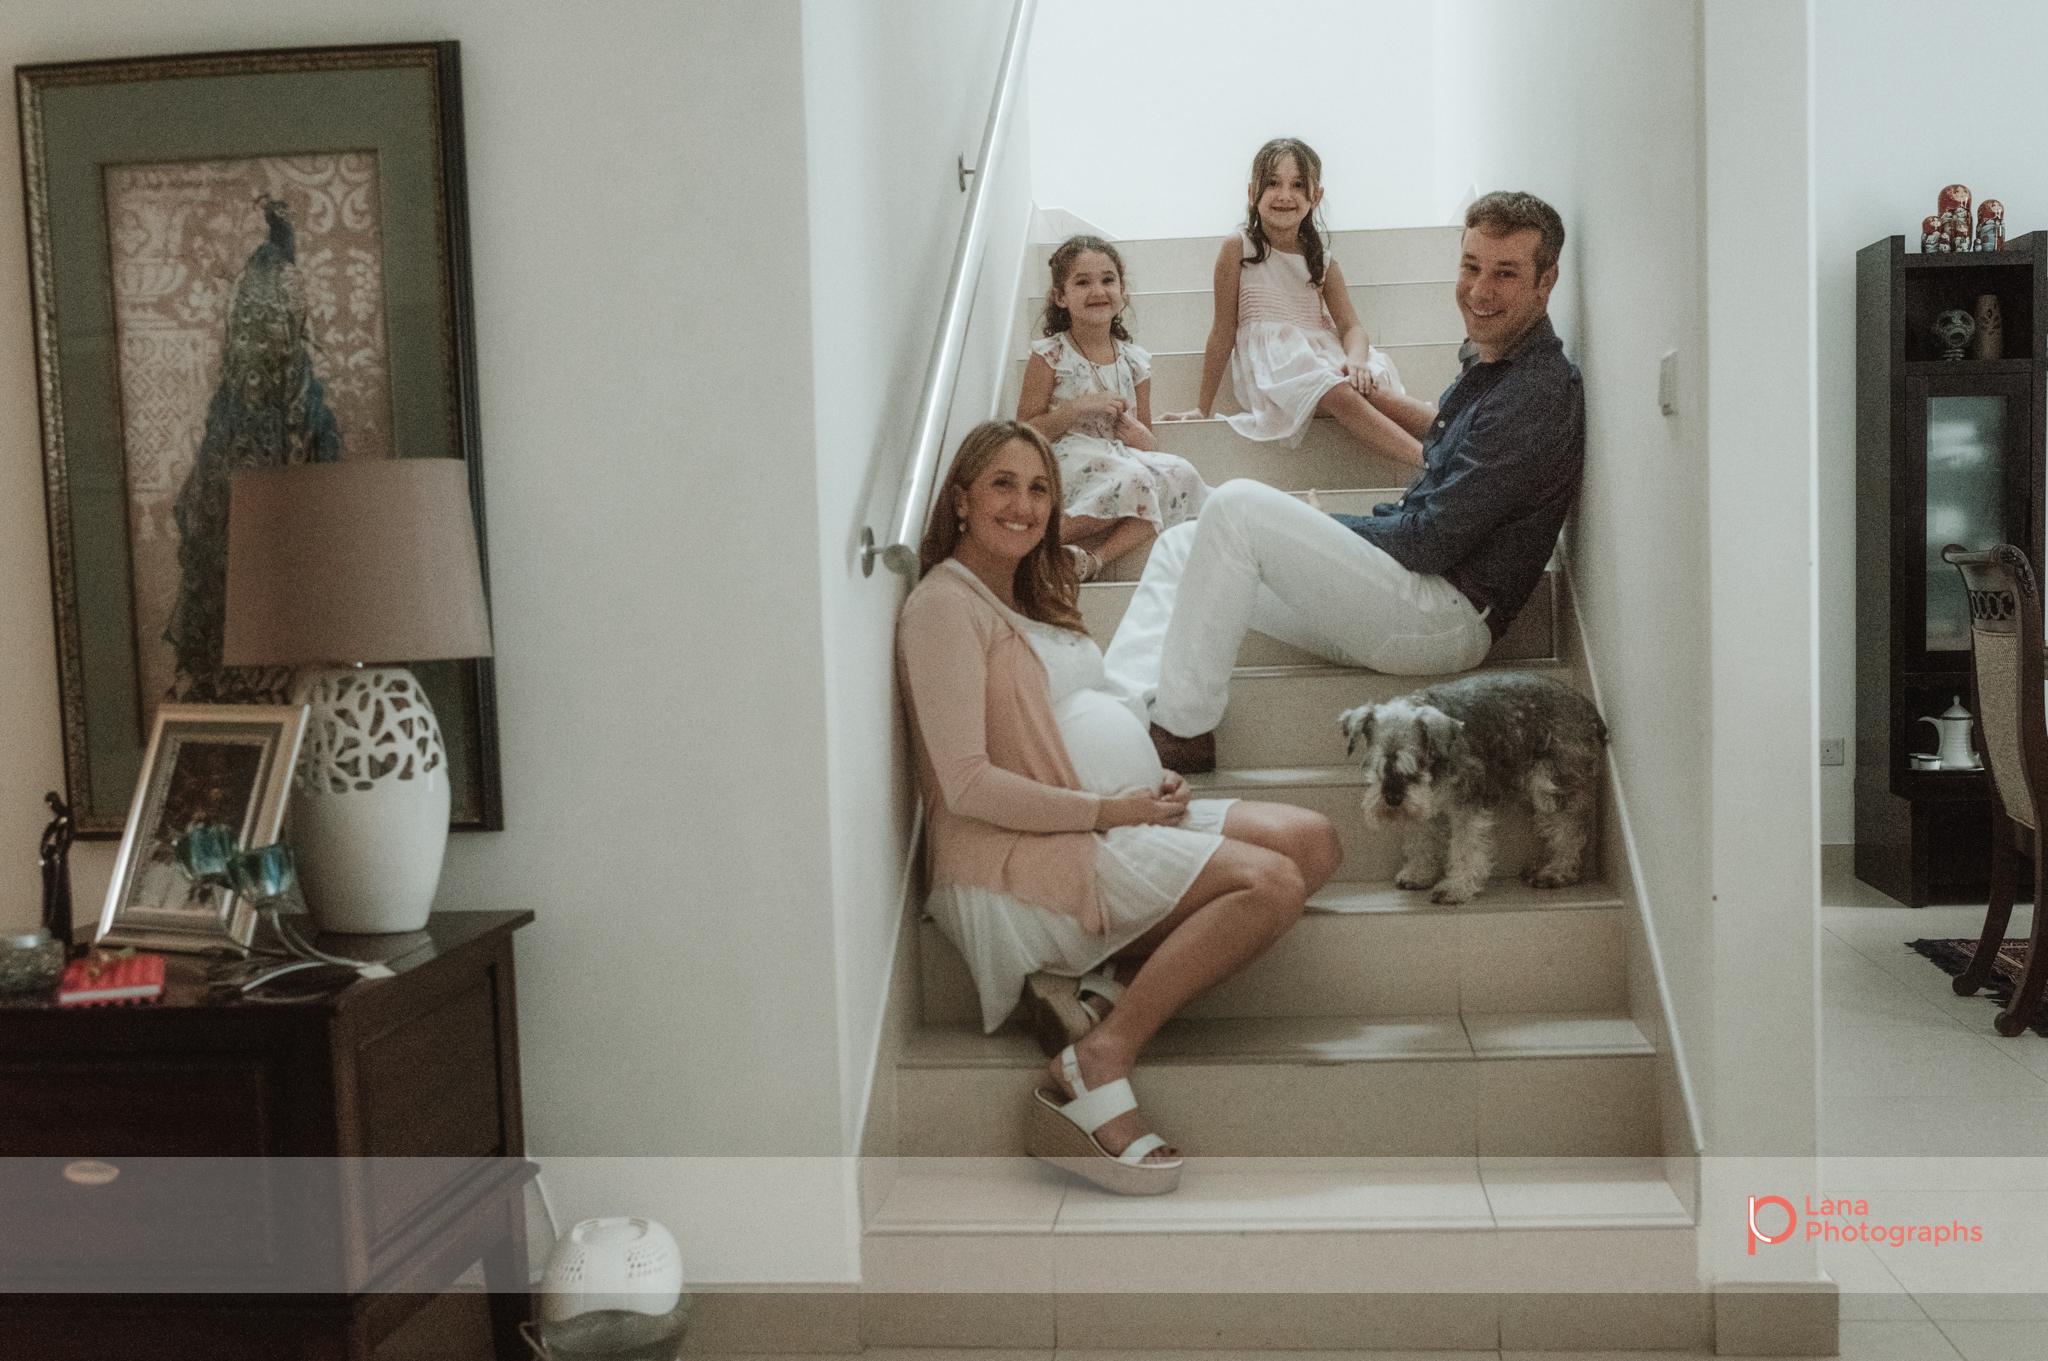 Lana-Photographs-Dubai-Family-Photography-Mayra-11.jpg